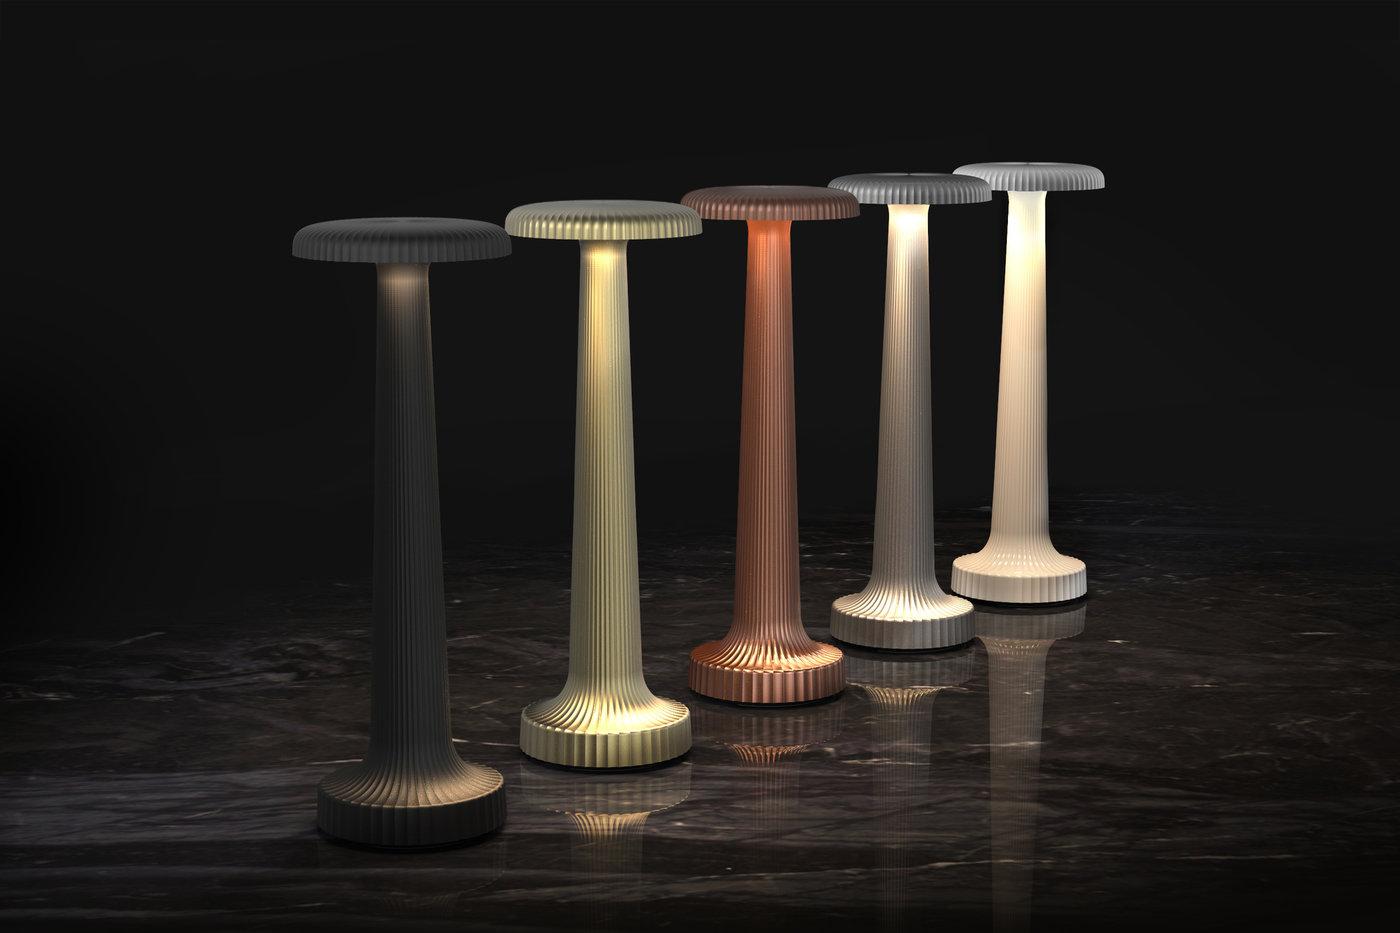 Www Neoz Com Neoz Cordless Lamp neoz tall poppy cordless table lampgabriel tam at